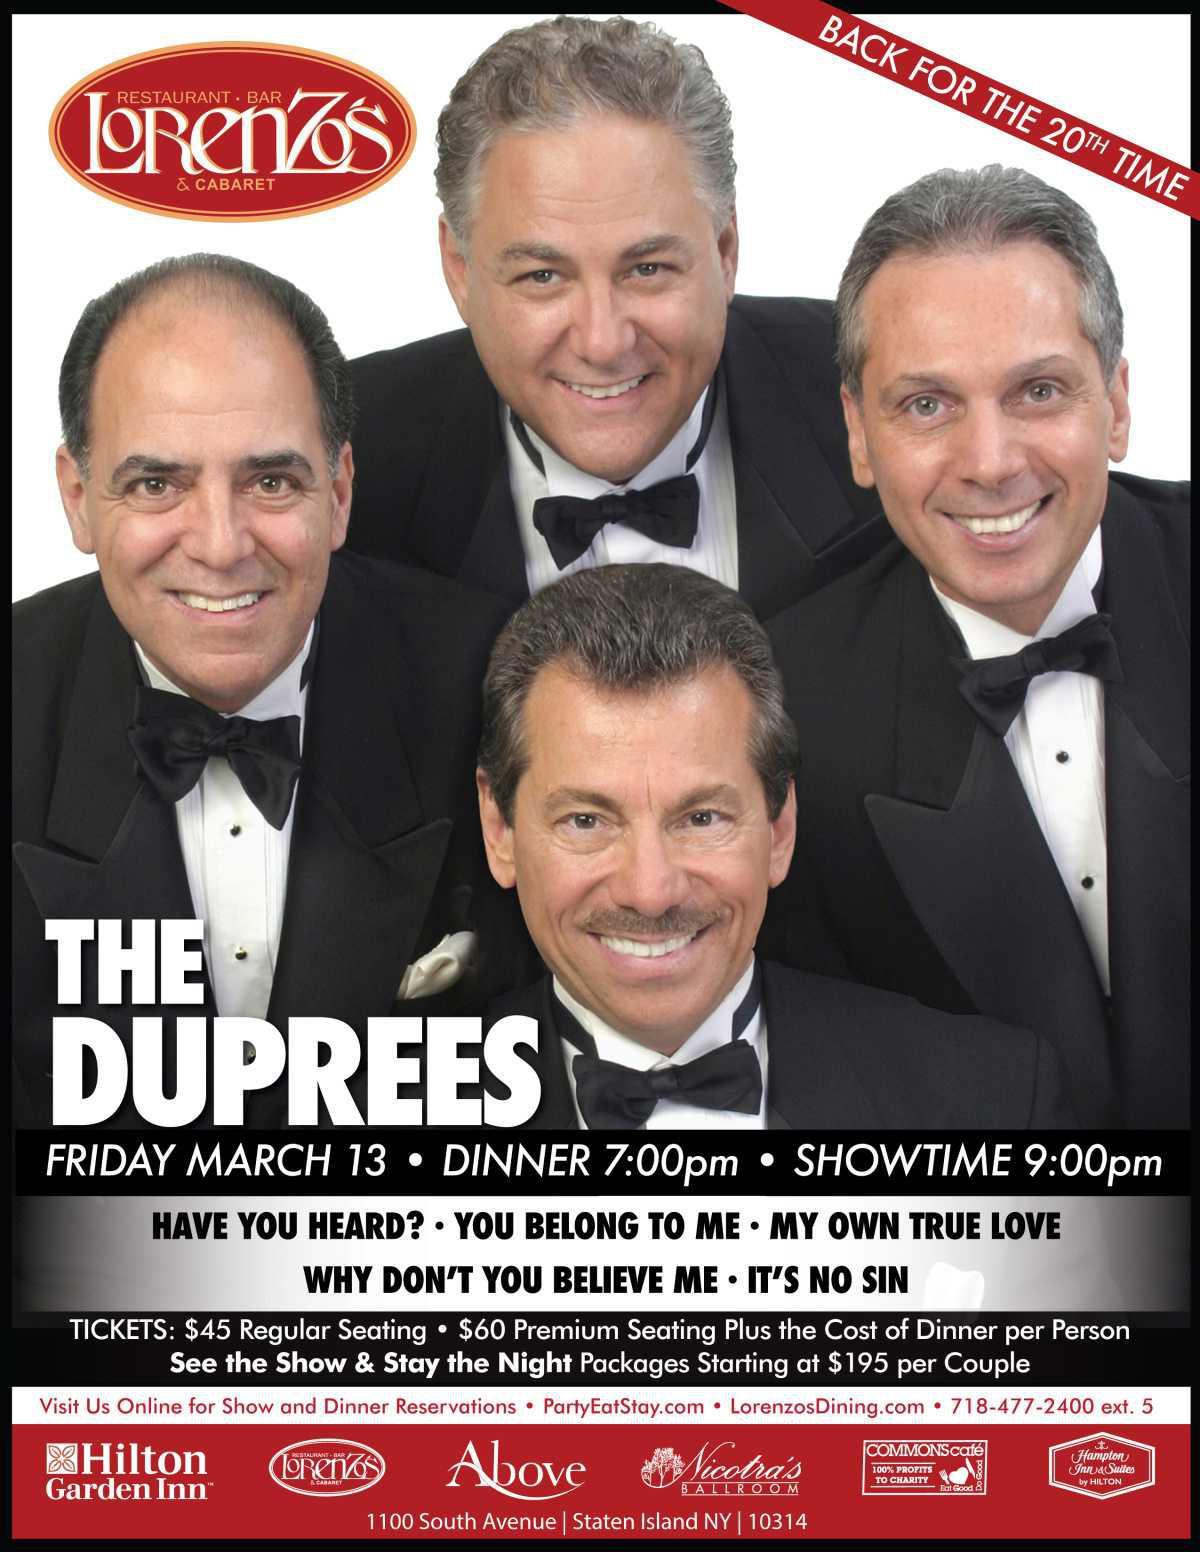 The Dupress